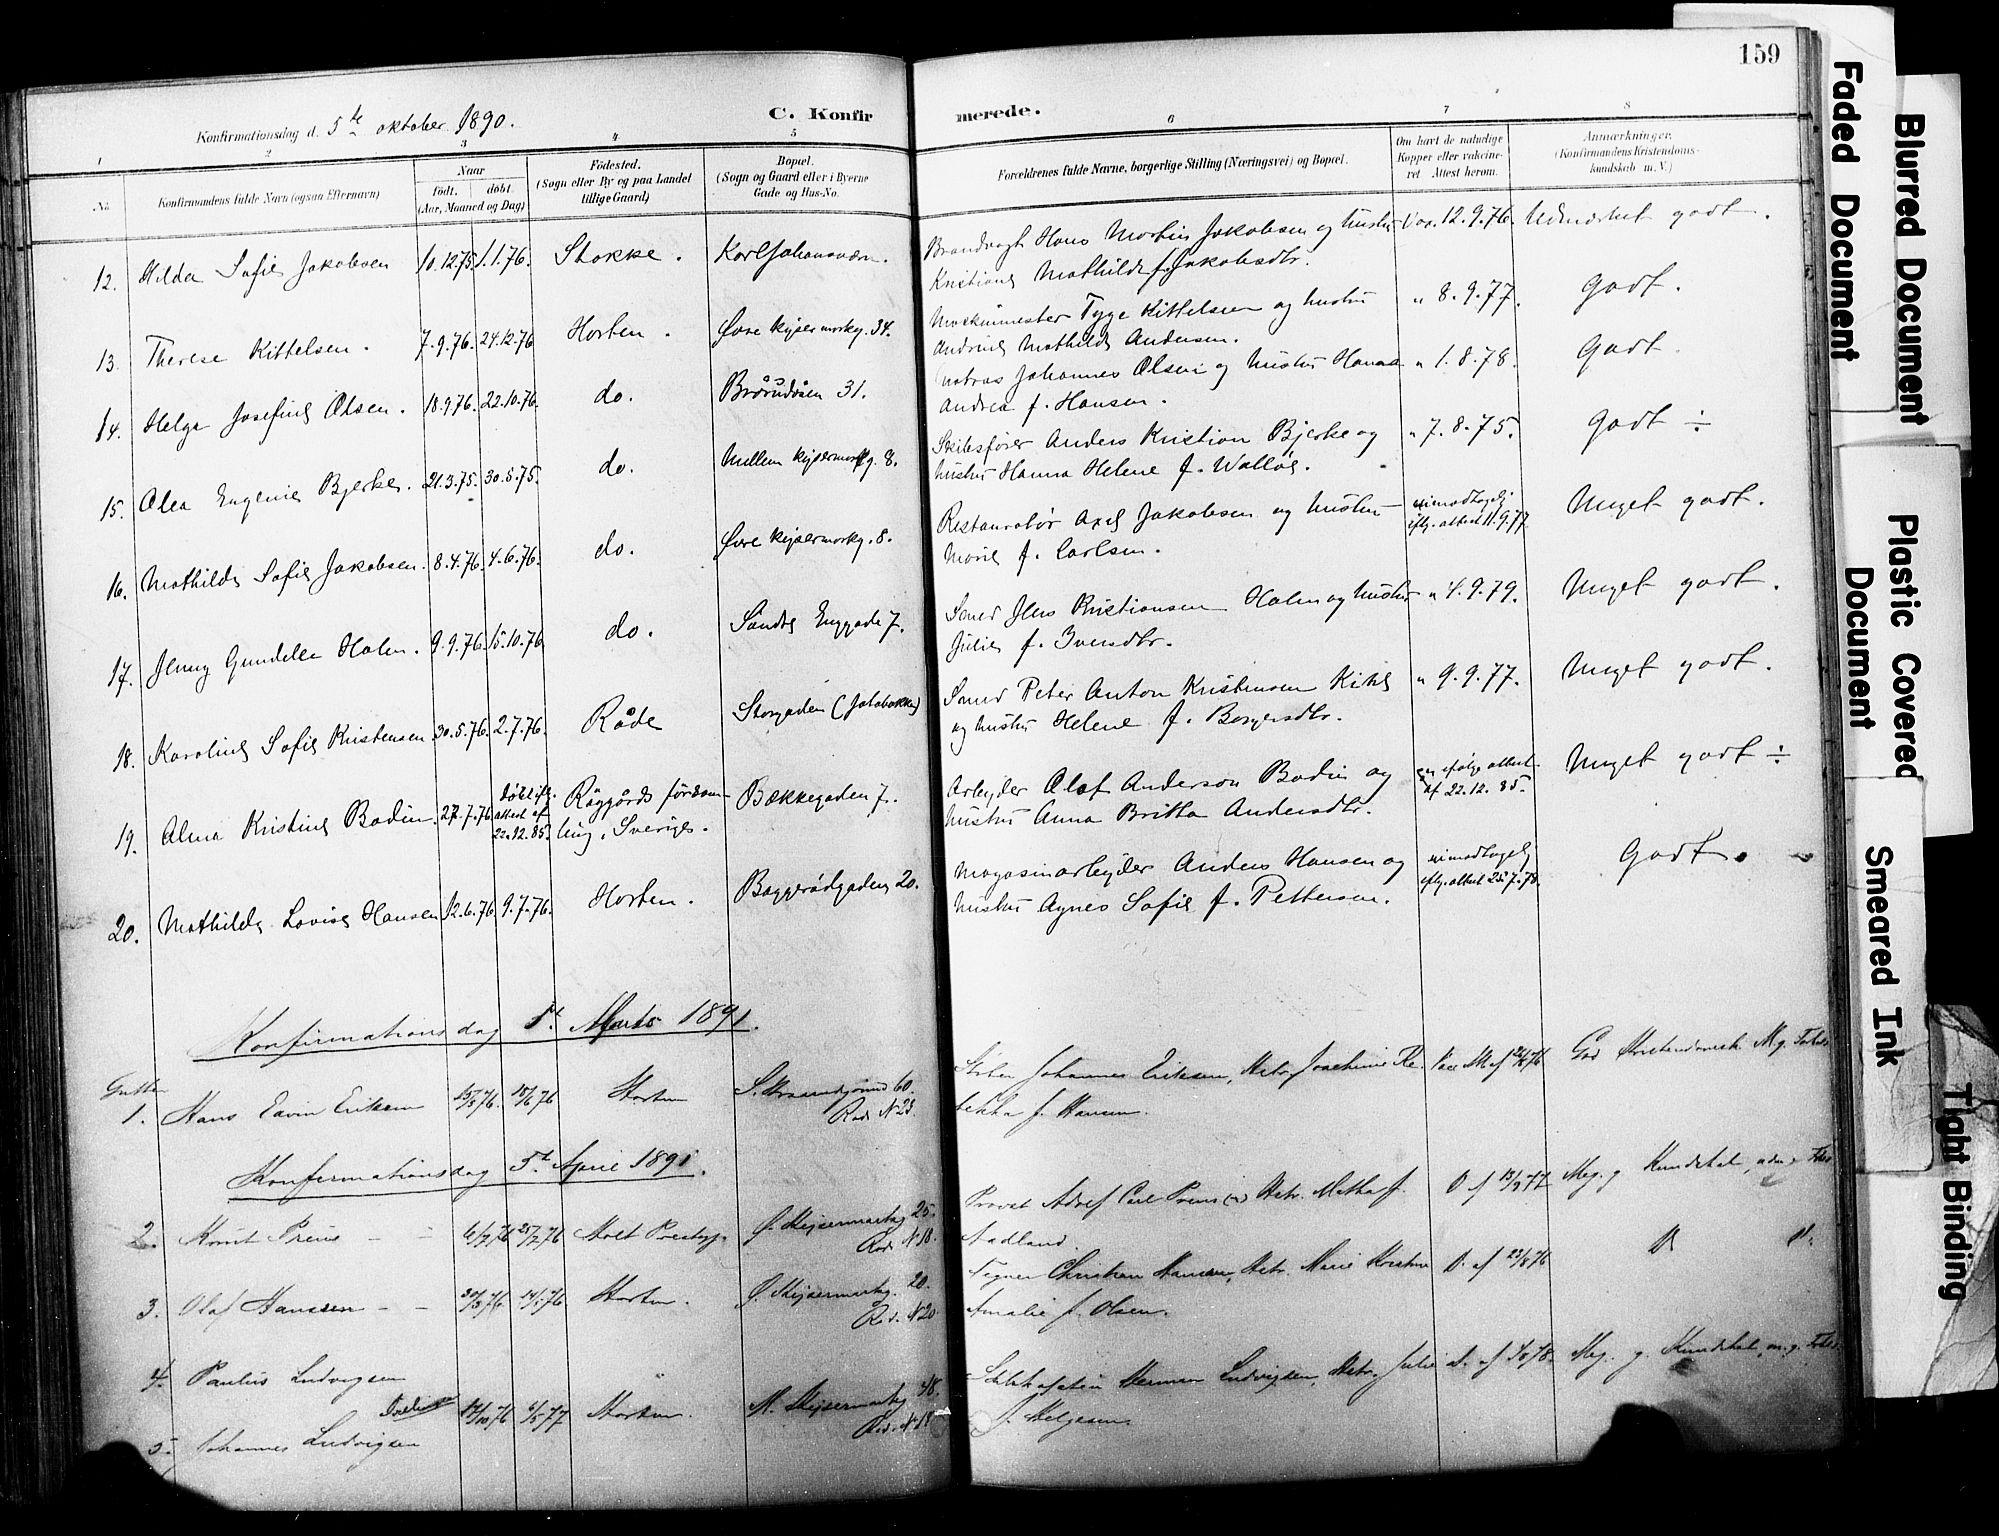 SAKO, Horten kirkebøker, F/Fa/L0004: Parish register (official) no. 4, 1888-1895, p. 159